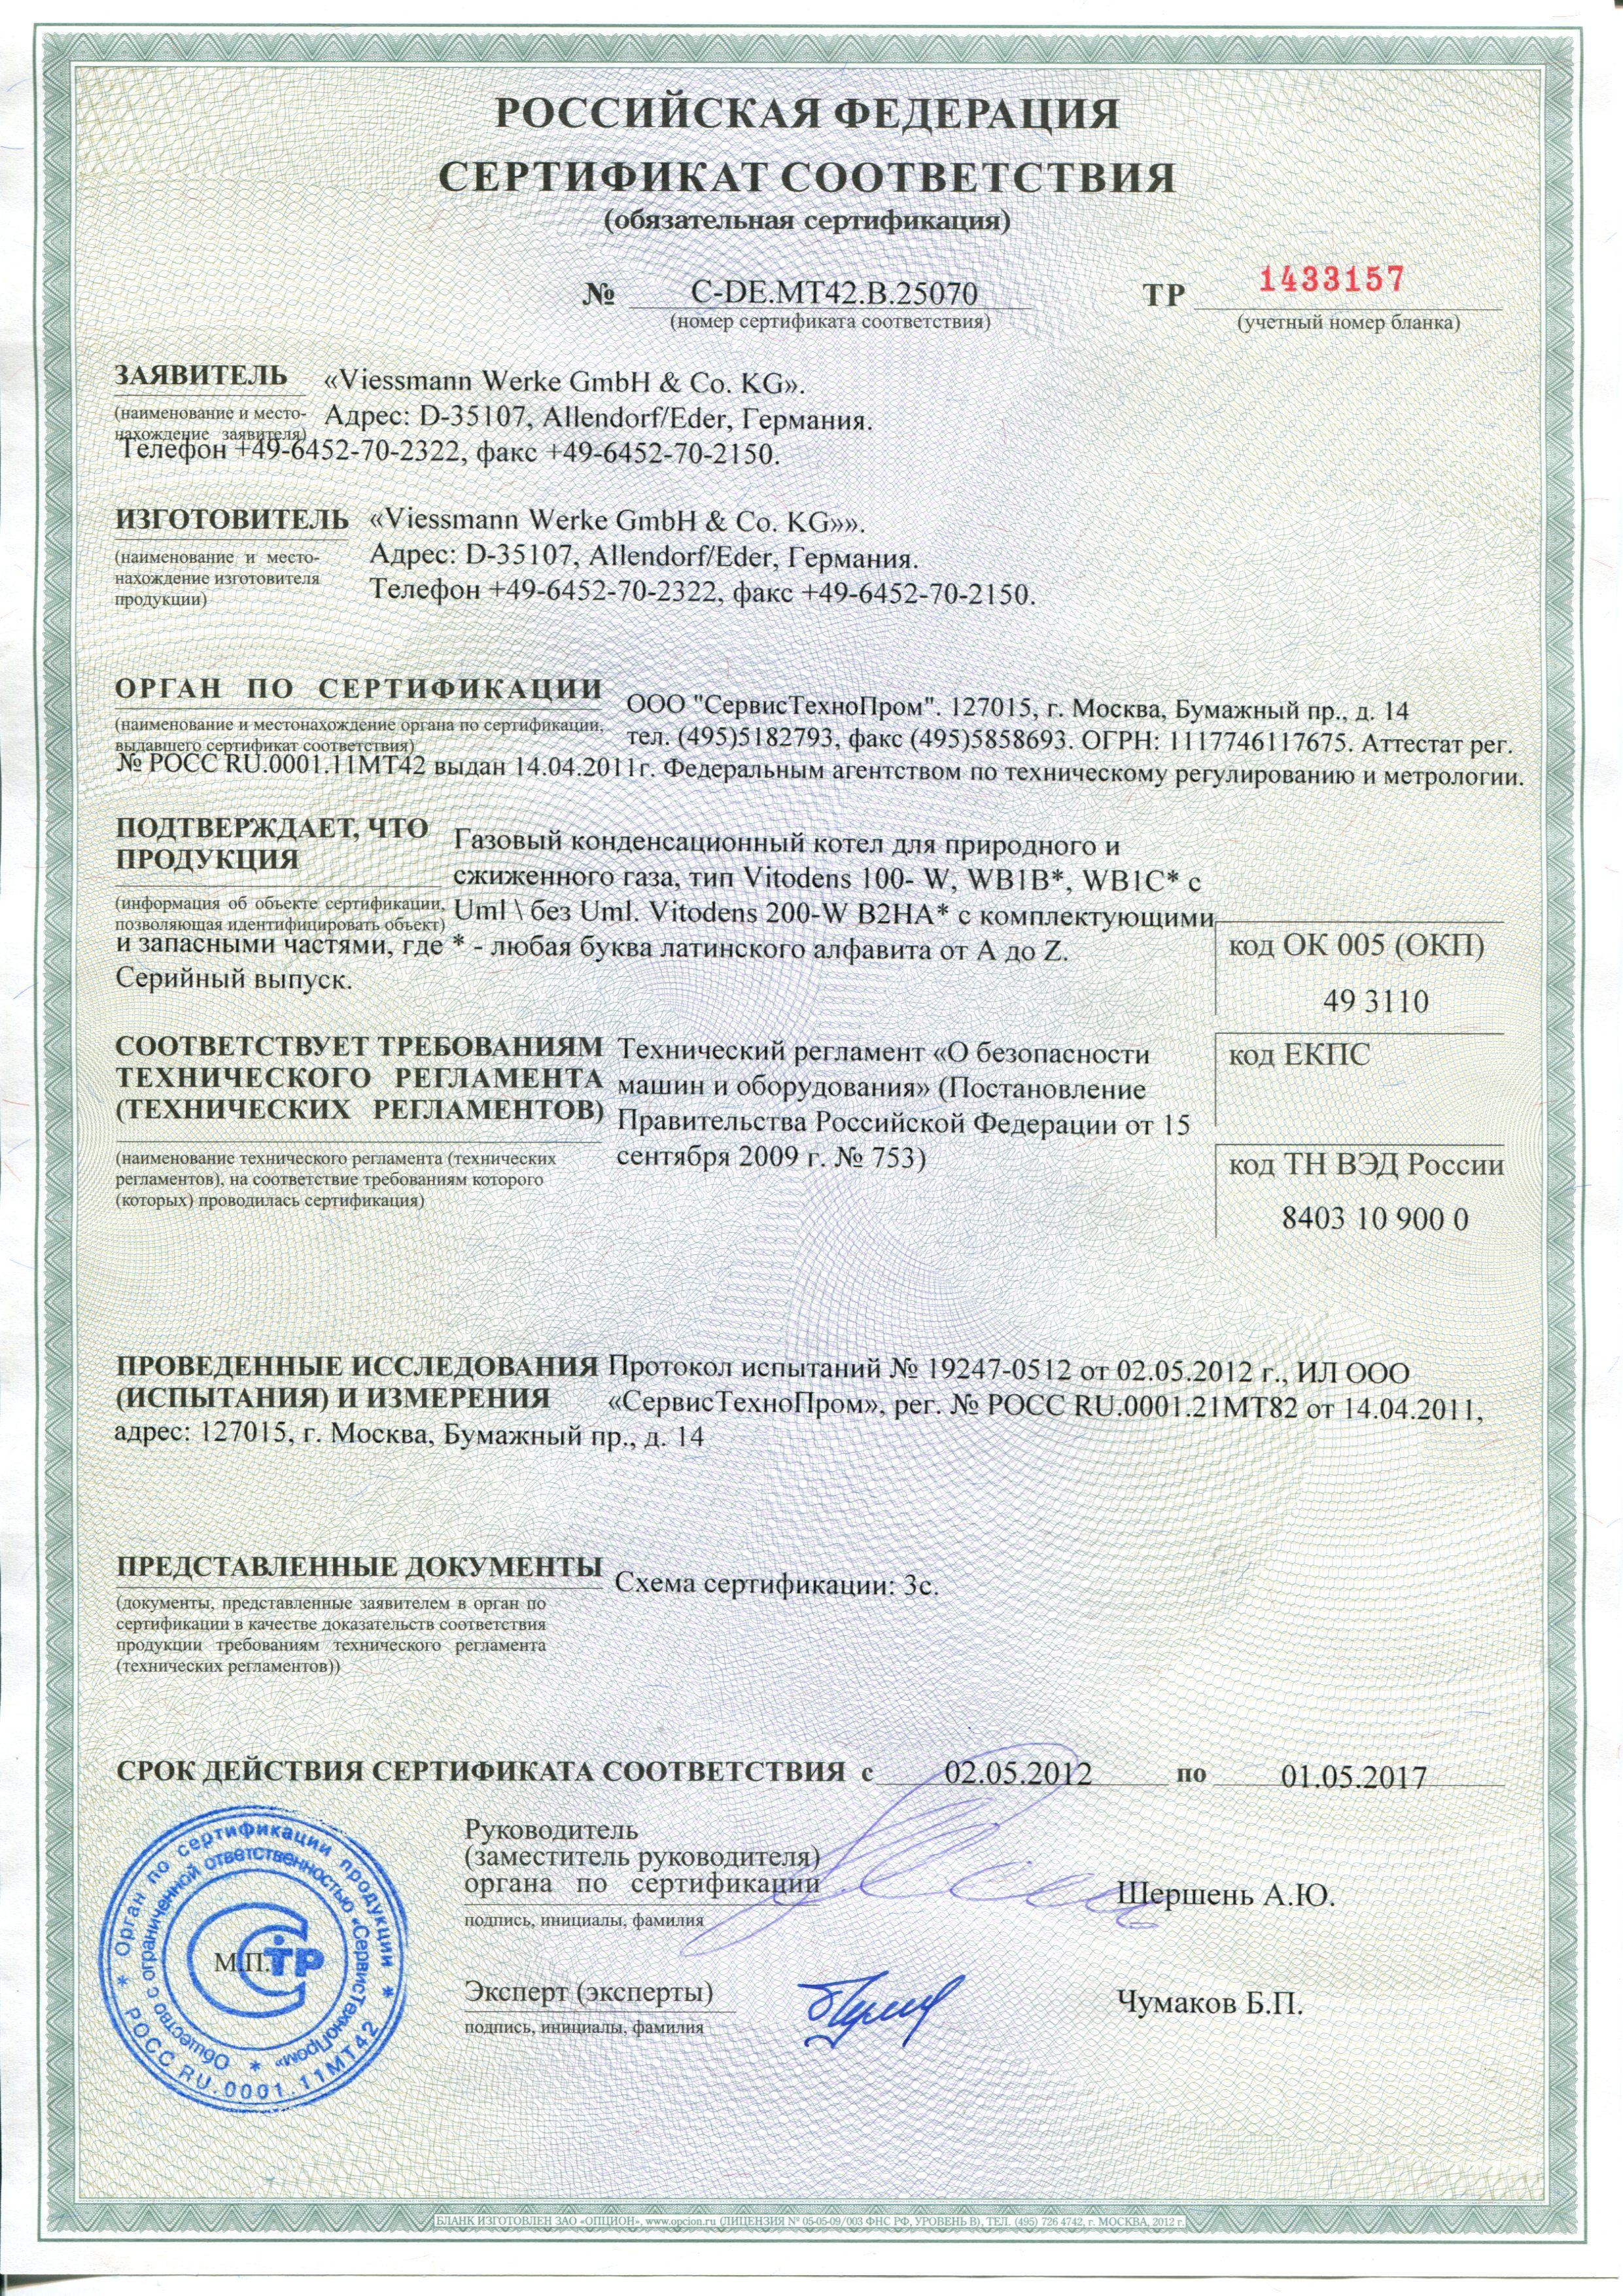 Котлы висман витоденс 200 сертификат microsoft сертификация украина